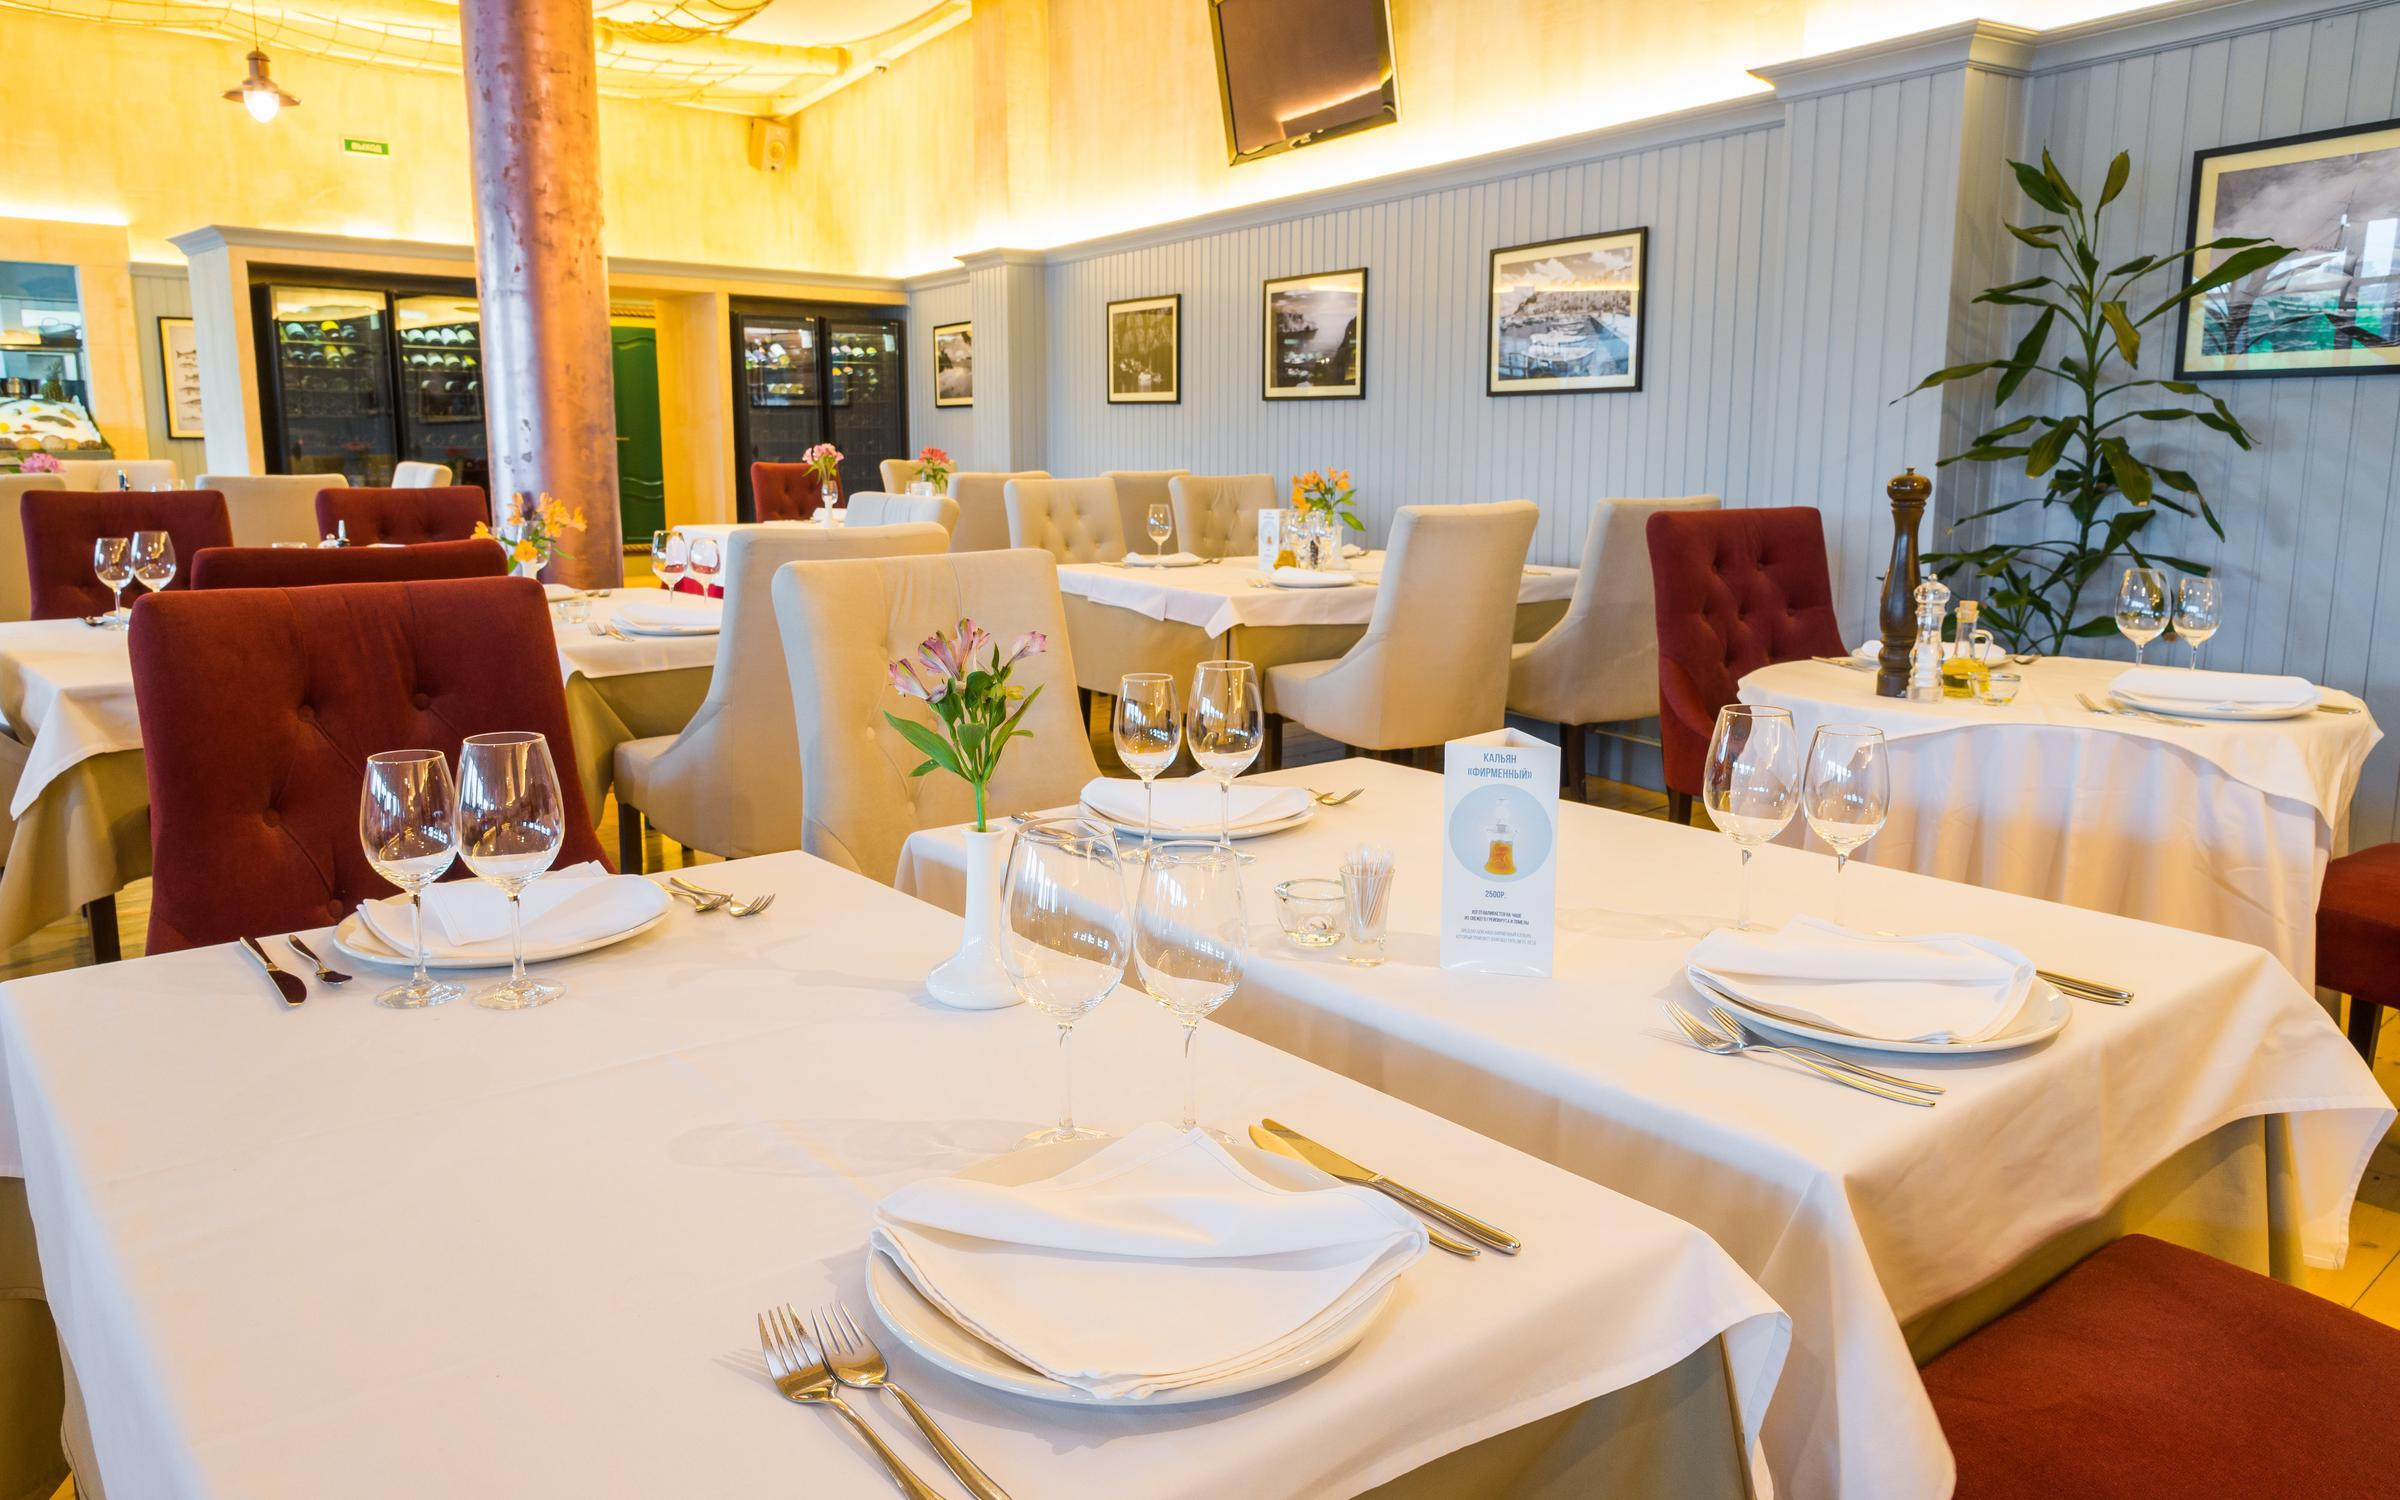 фотография Ресторана Porto Maltese на метро Приморская